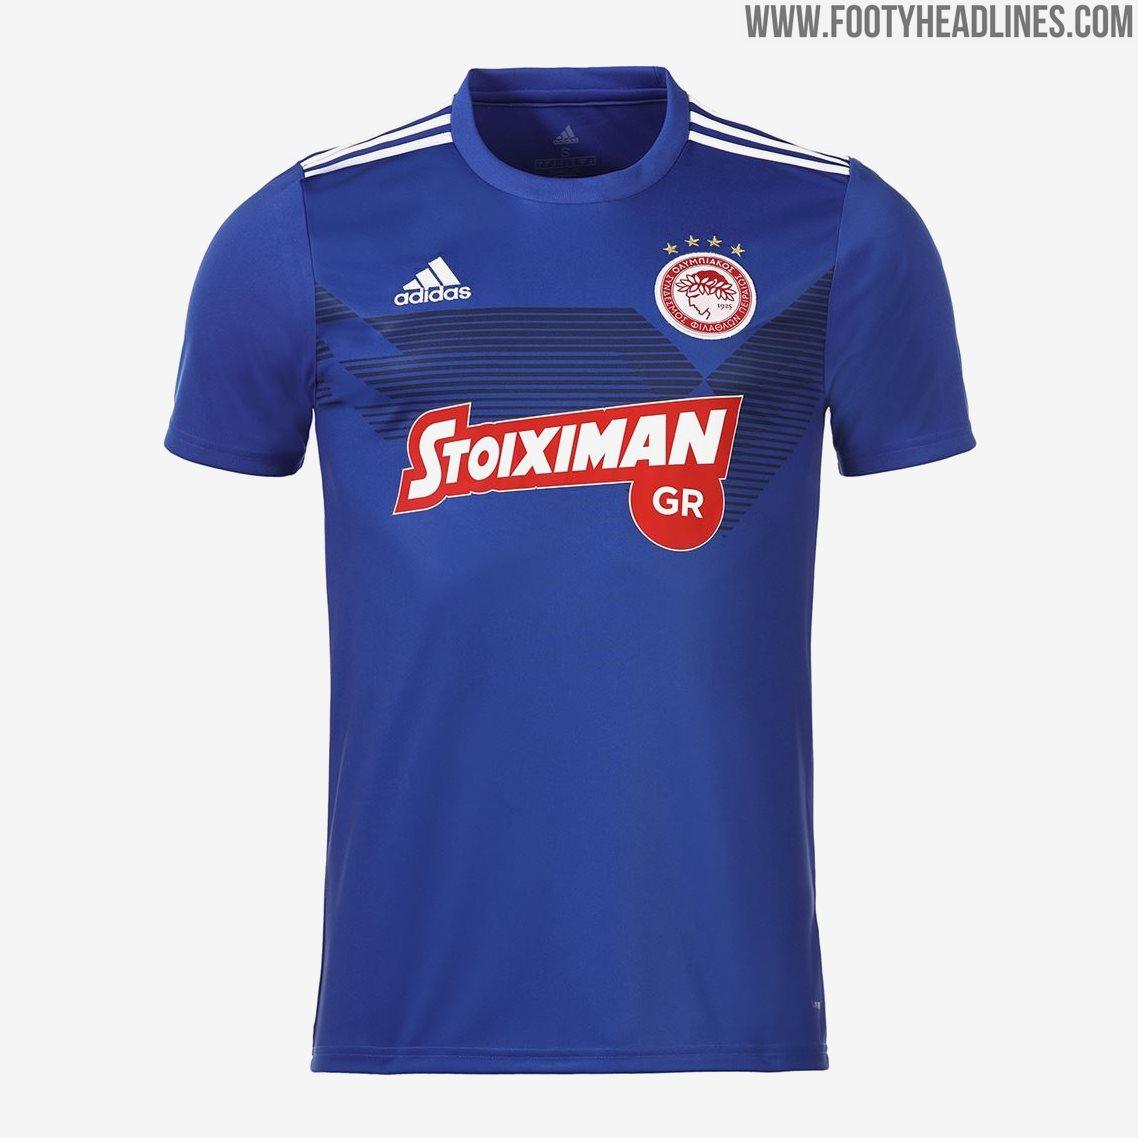 adidas Schiedsrichter Trikot 20192020 bright cyan blau